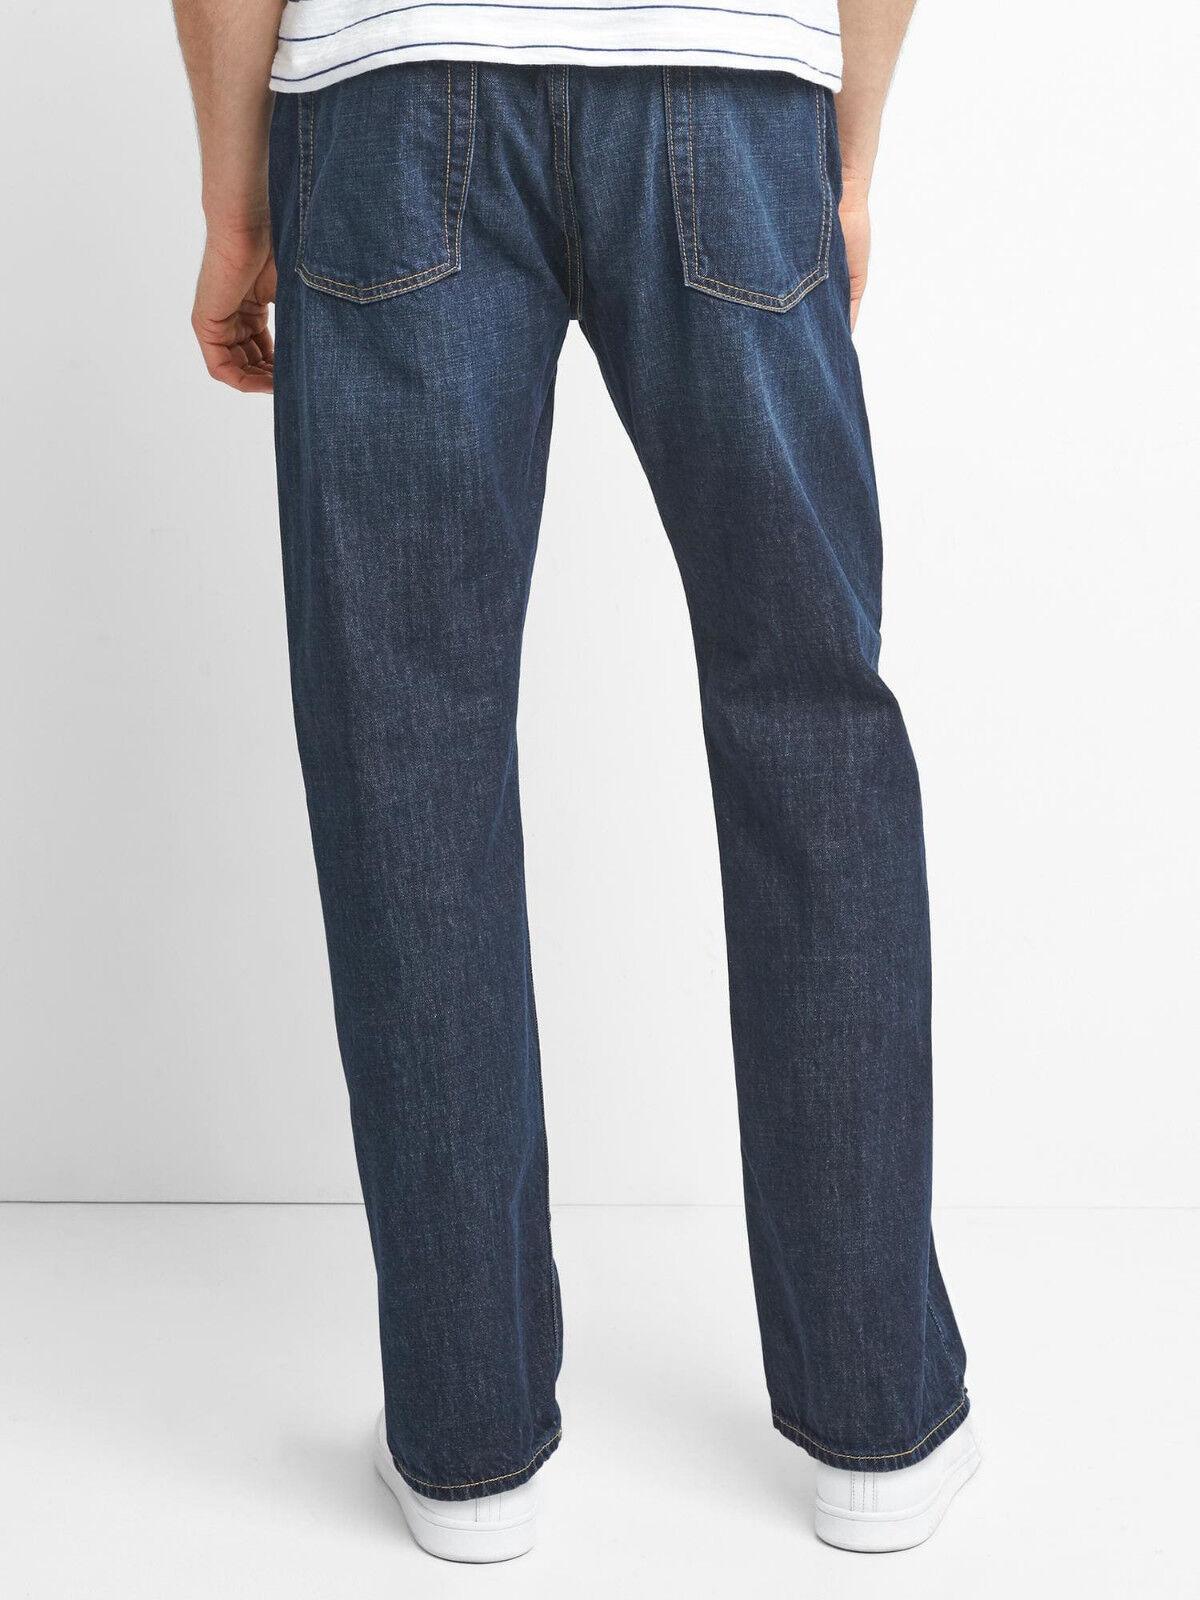 JW Anderson x Uniqlo Men's JWA Vintage Straight Jeans Kaihara Denim NEW 32x34